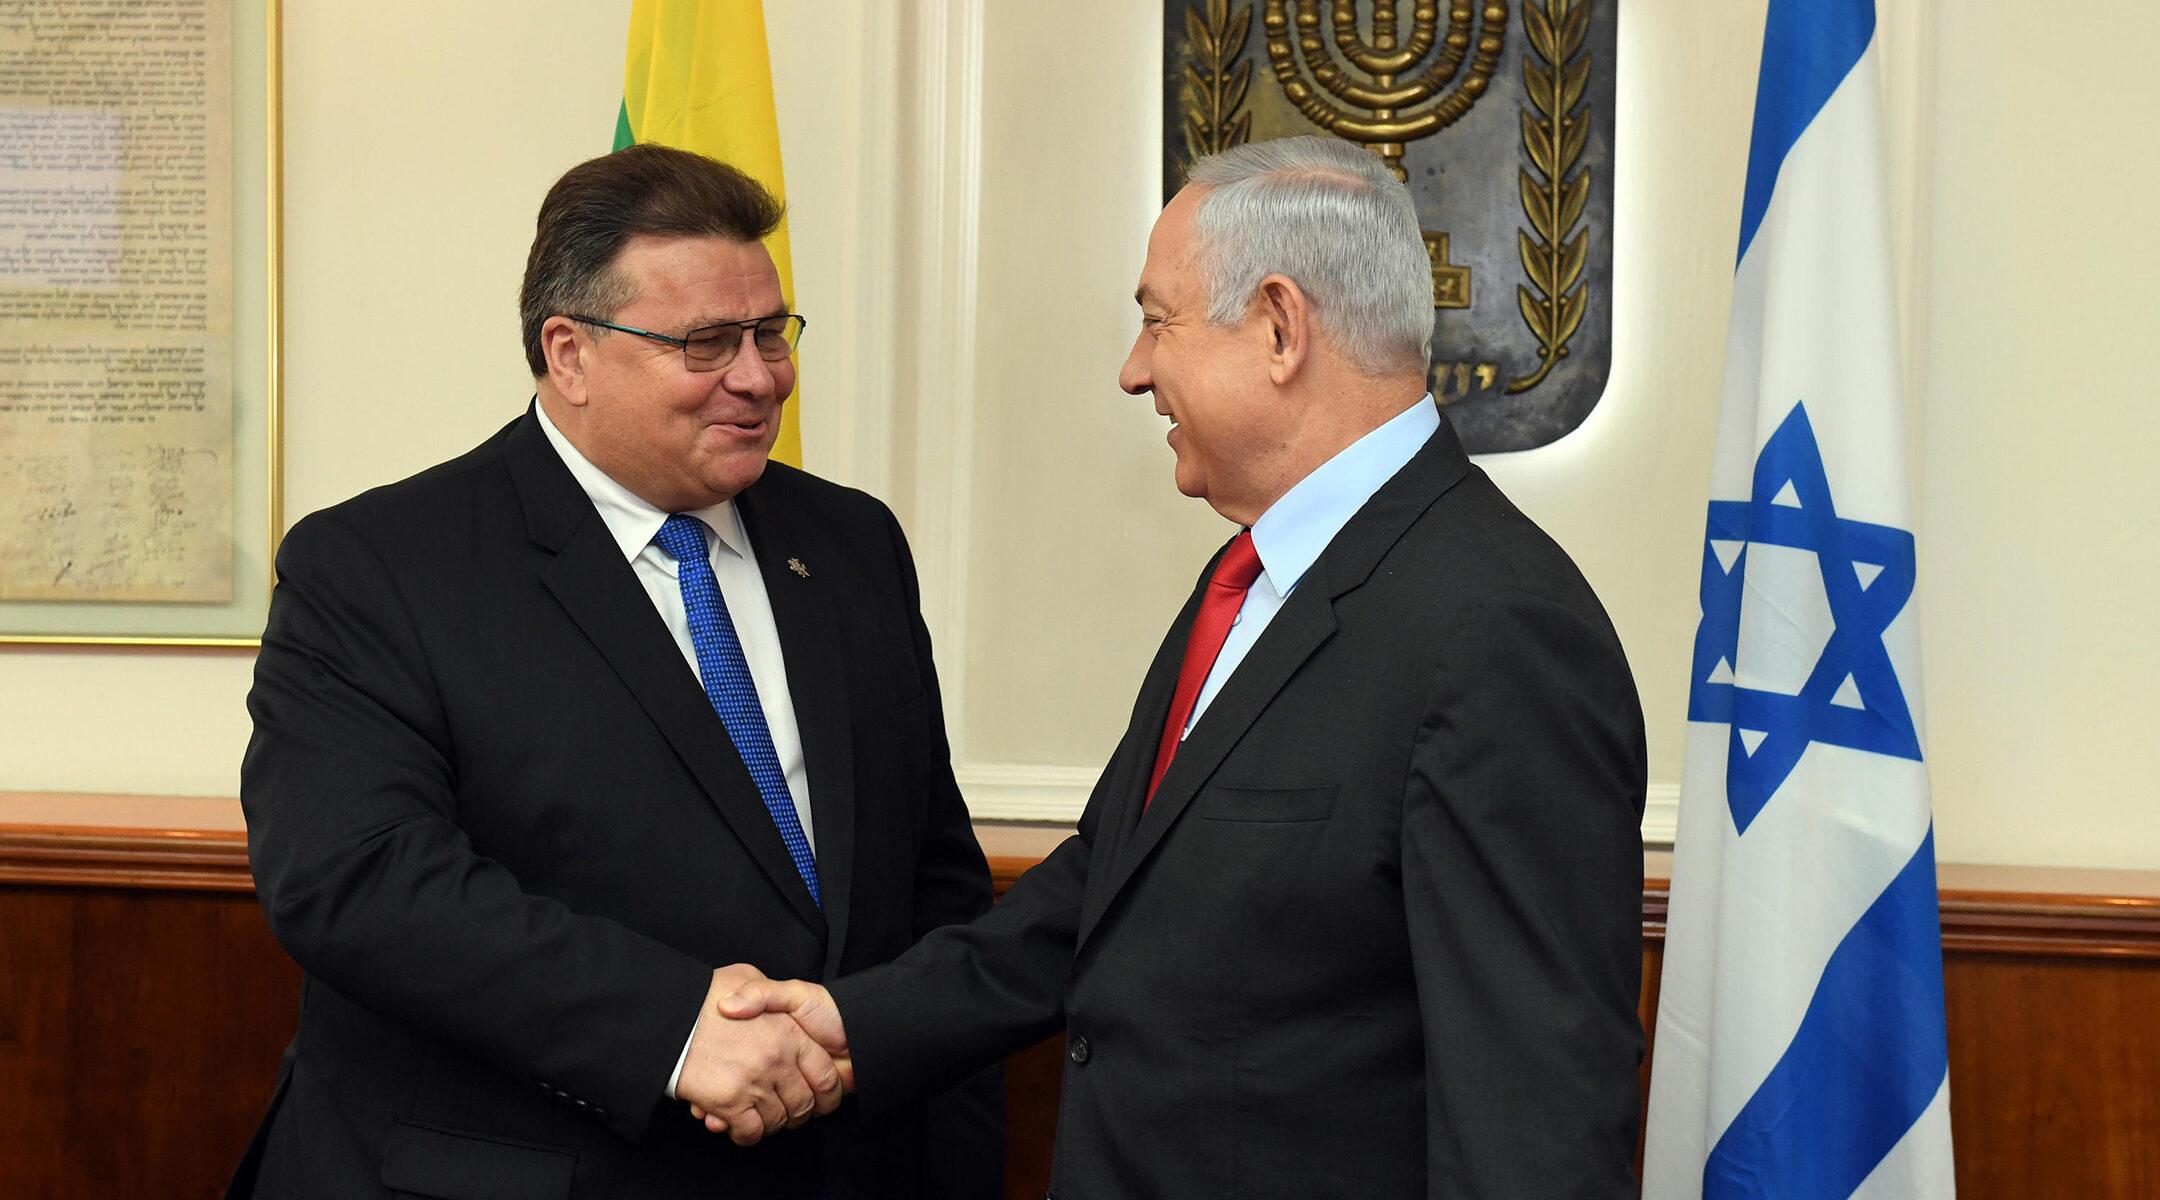 Israeli Prime Minister Benjamin Netanyahu meets Lithuanian Foreign Minister Linas Antanas Linkevičius in Jerusalem, Israel on Sept. 4, 2017. (Haim Zach/GPO)